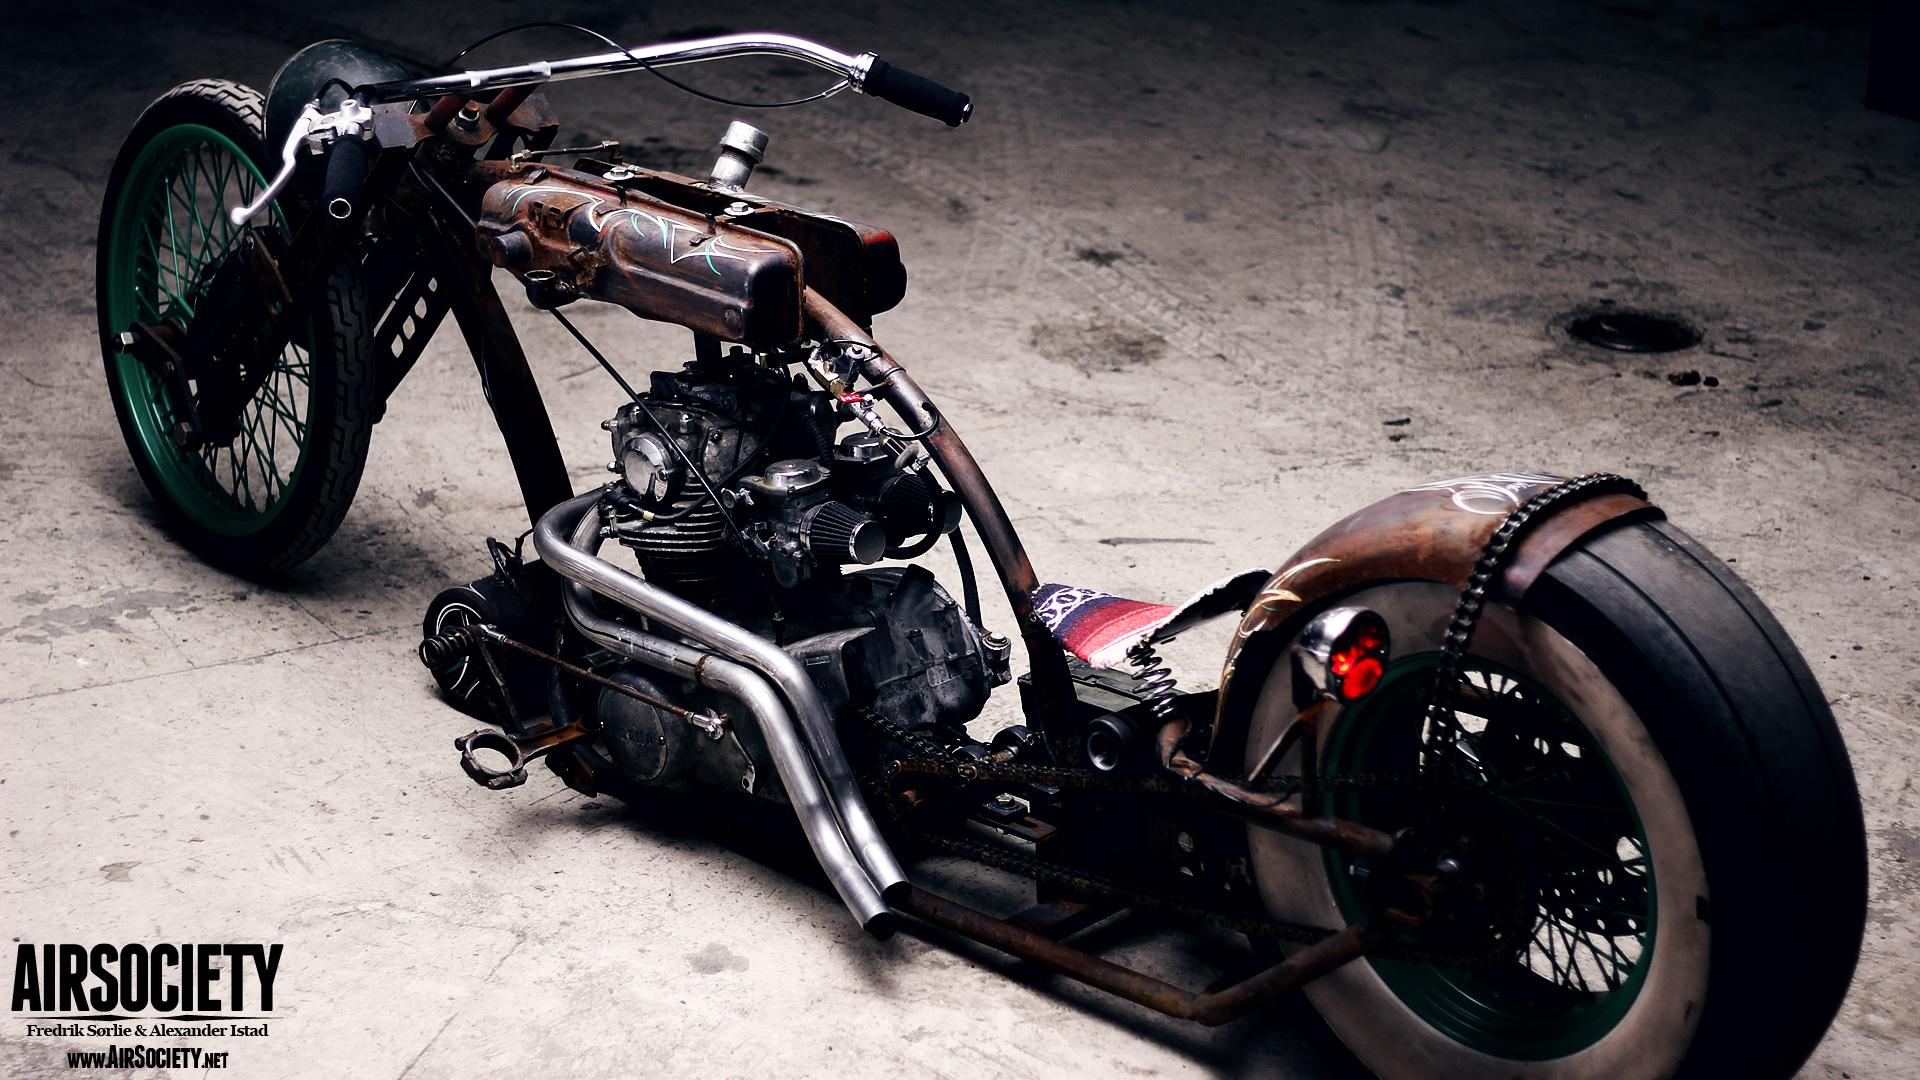 bagged rust motorcycle chopper yamaha xs650 wallpaper 008jpg 1920x1080